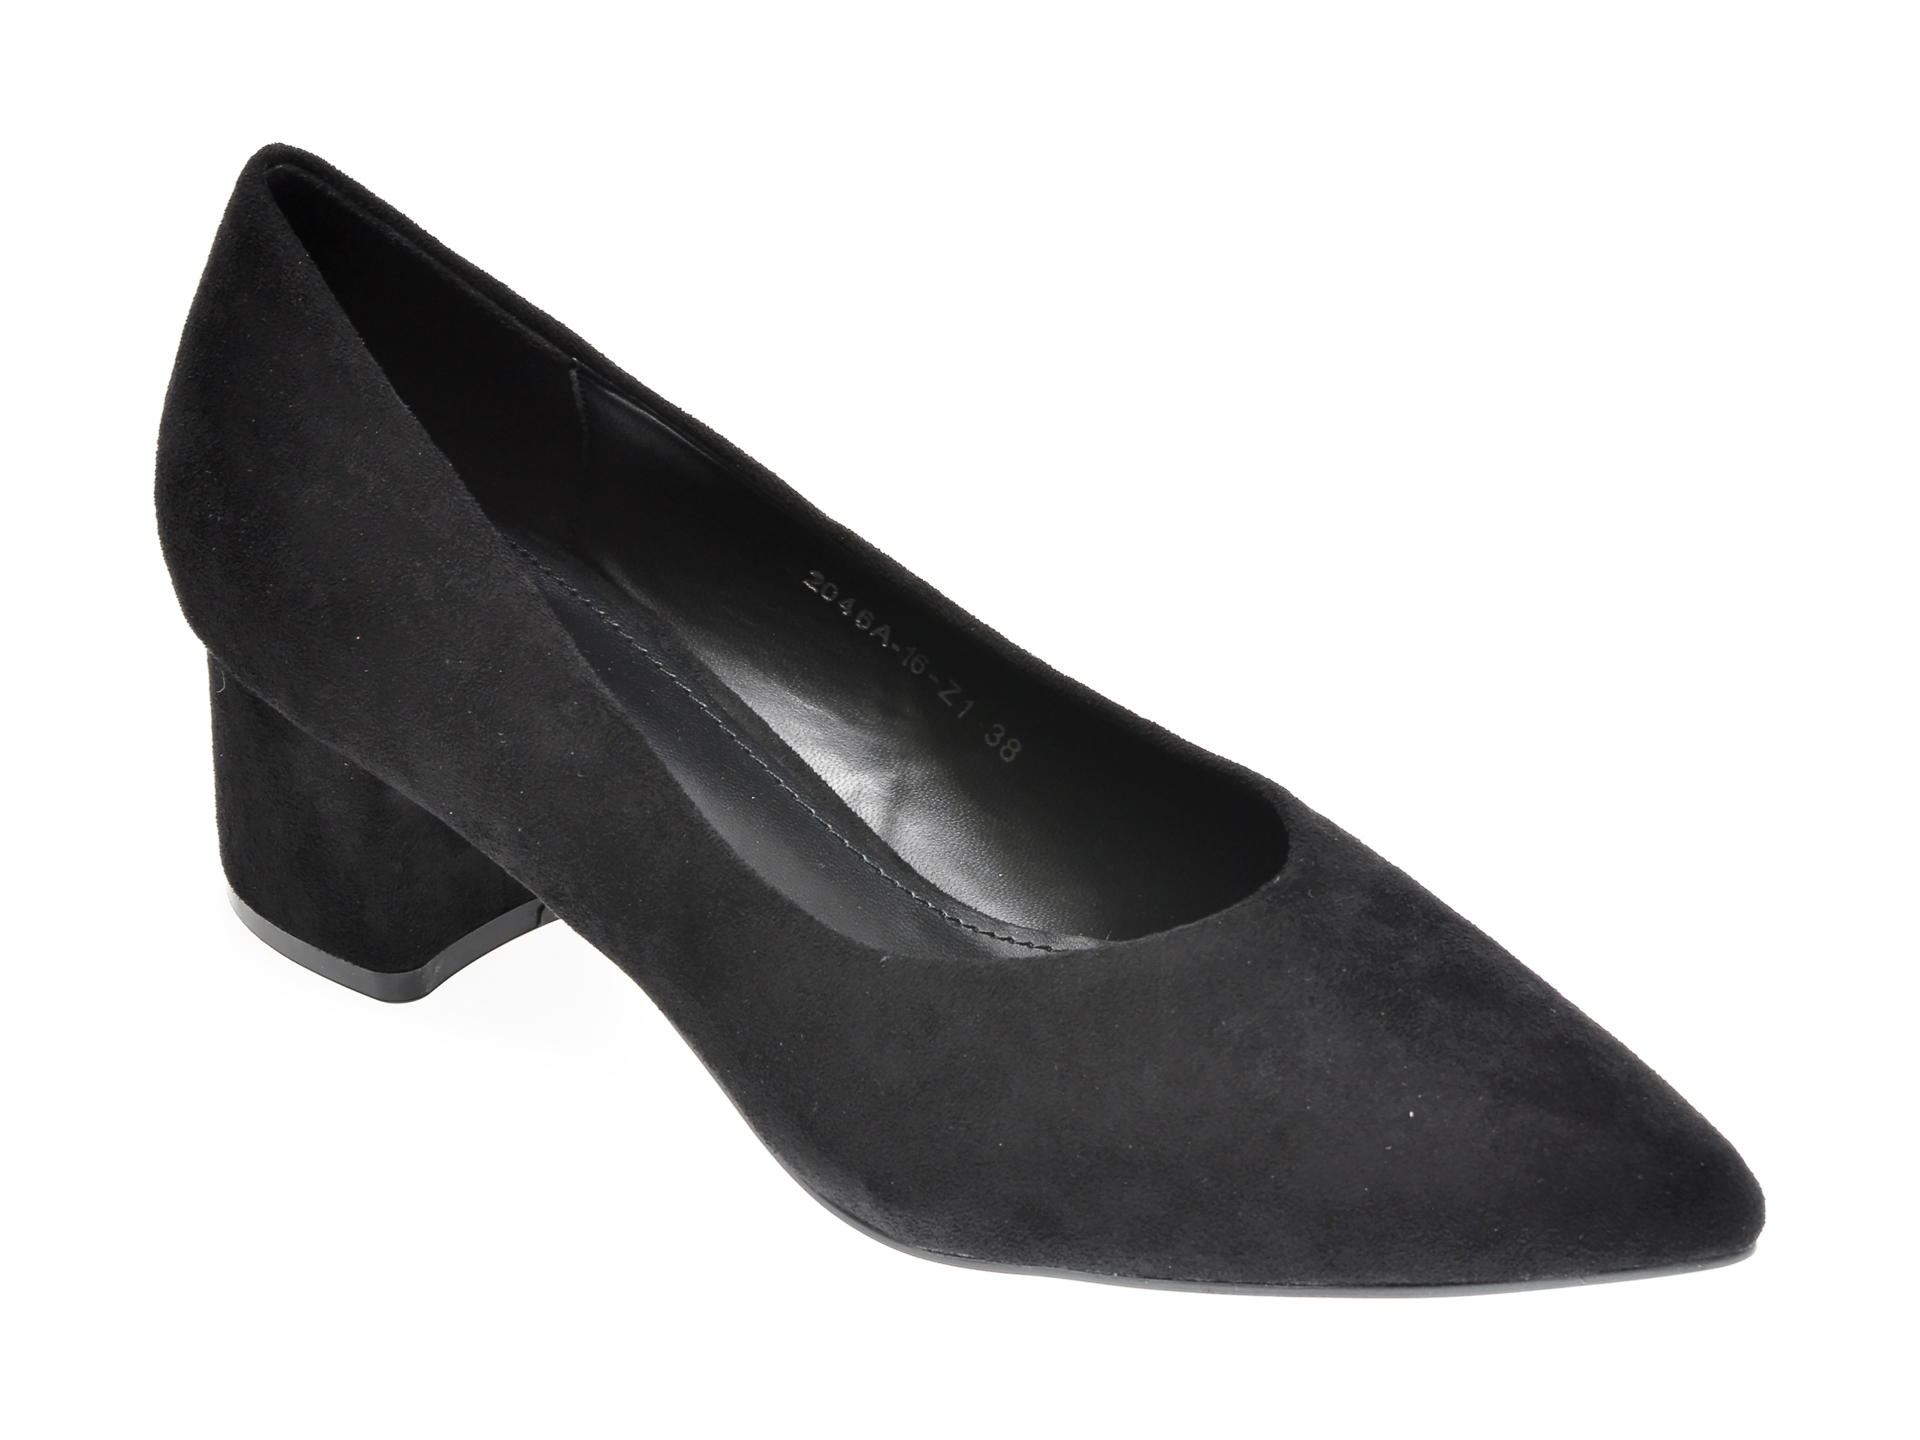 Pantofi RIO FIORE negri, 2046A, din piele ecologica imagine